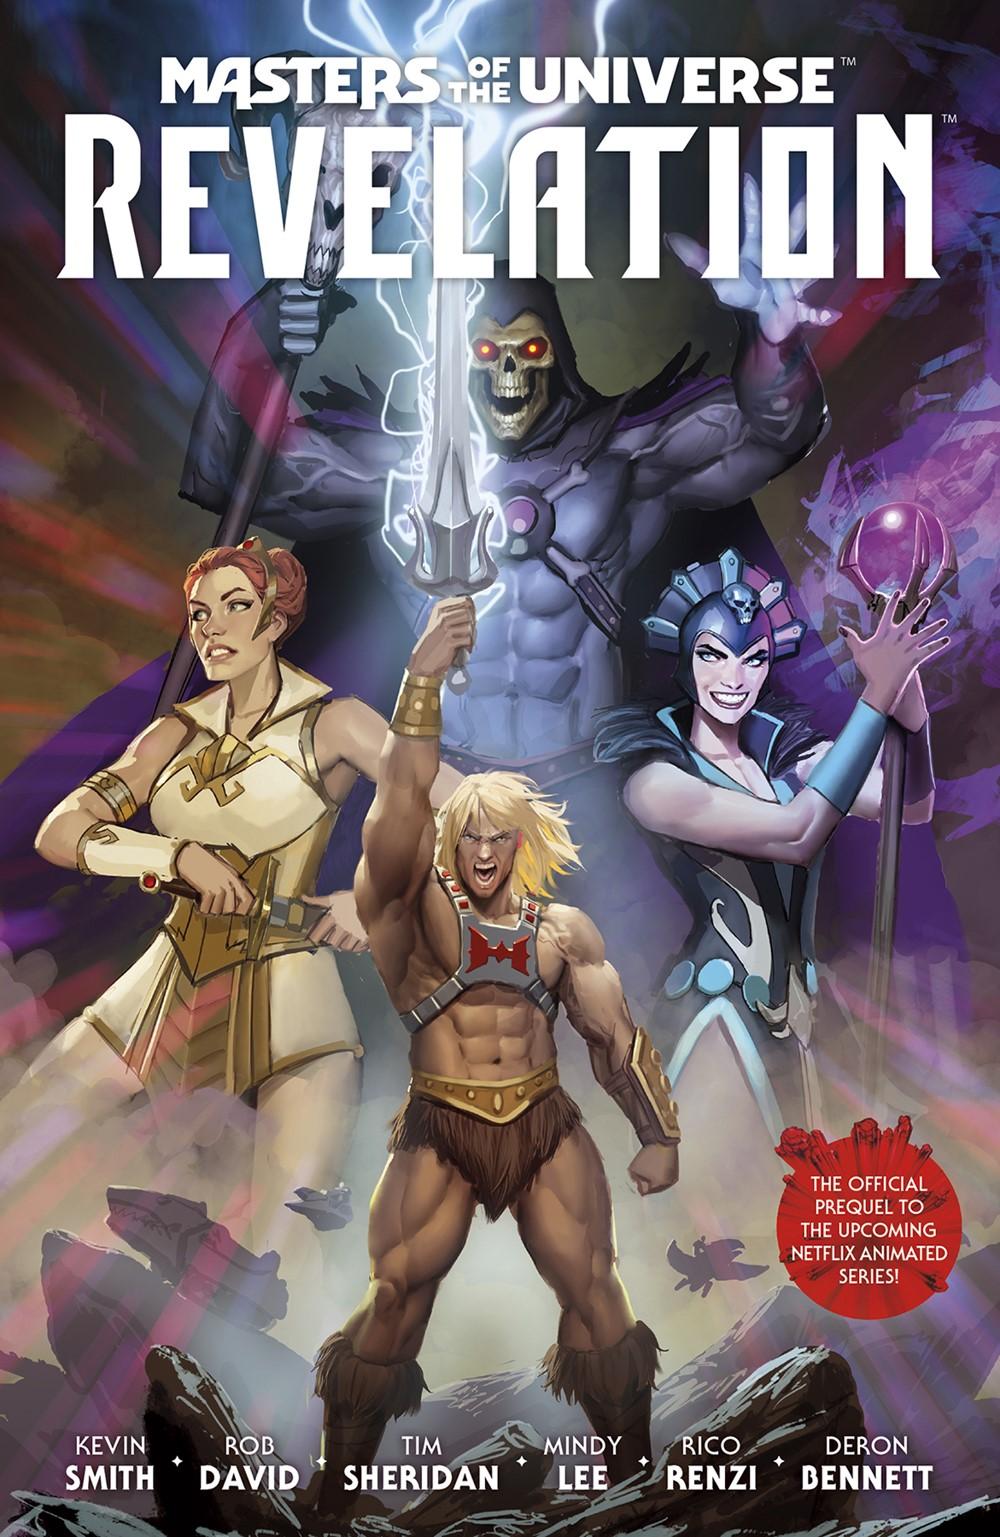 MOTUREV_TPB_CVR_4x6_SOL Dark Horse Comics December 2021 Solicitations